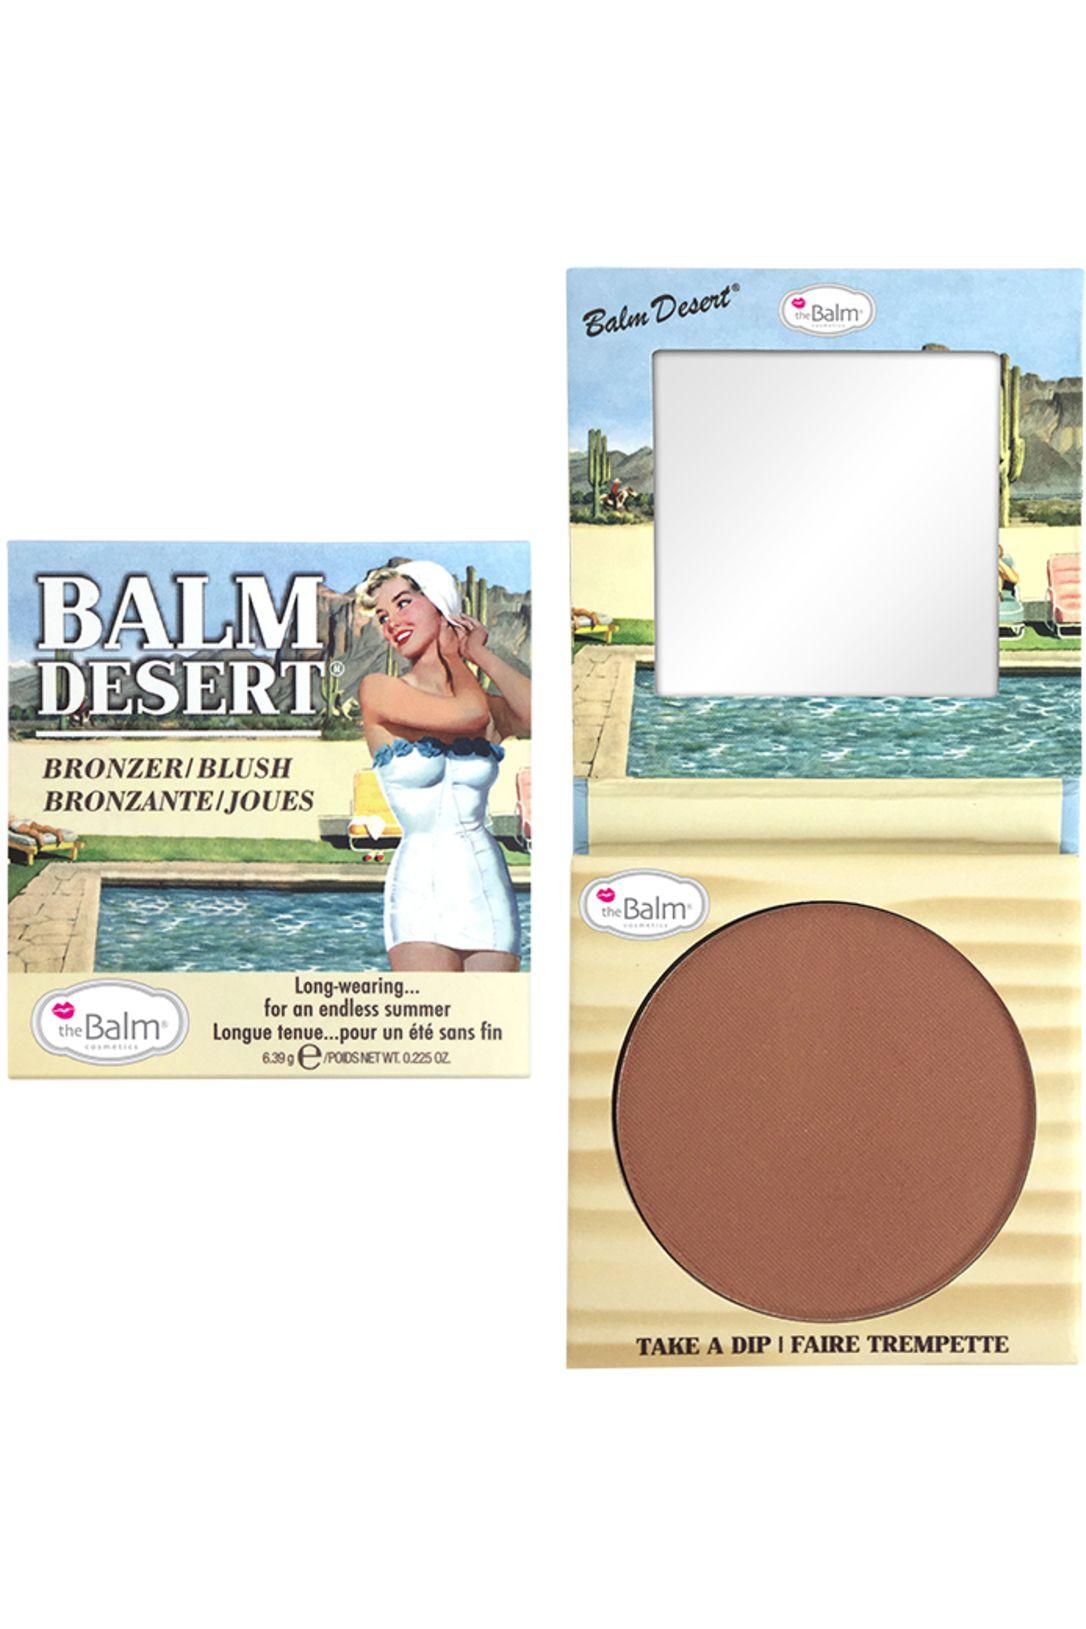 Blissim : theBalm® cosmetics - Balm Desert Bronzer - Balm Desert Bronzer